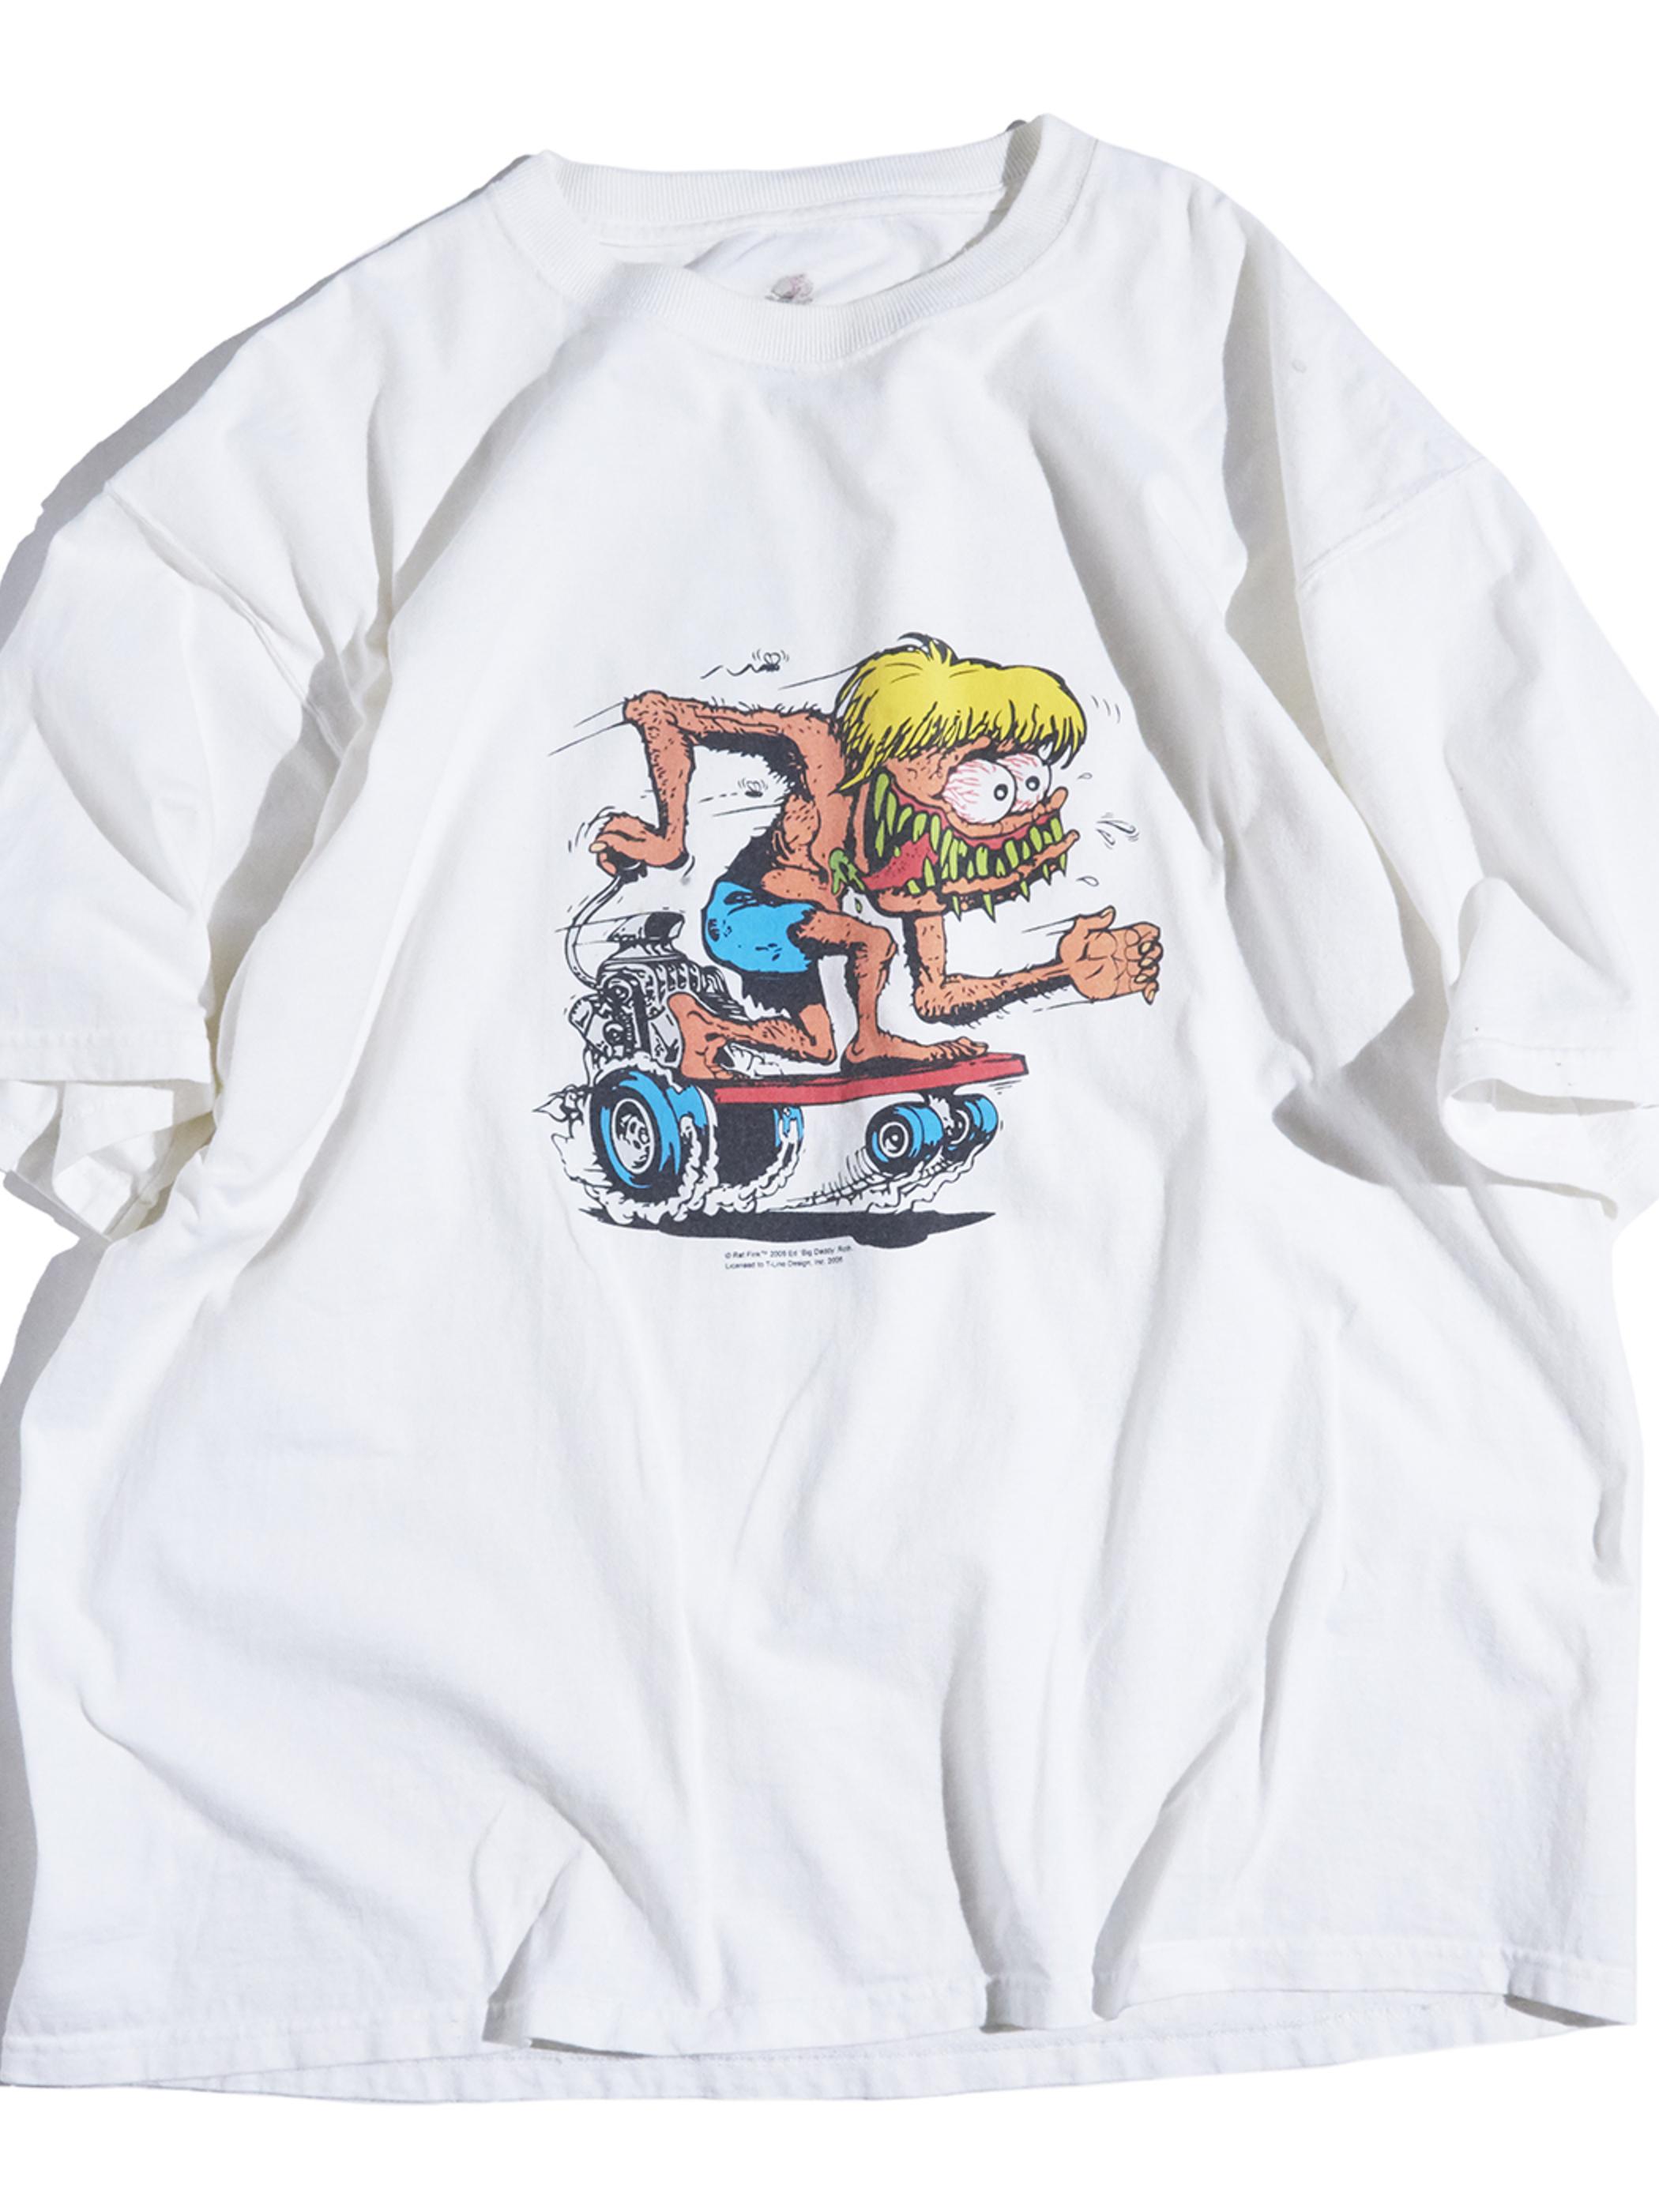 "2000s ""RAT FINK"" print tee -WHITE-"